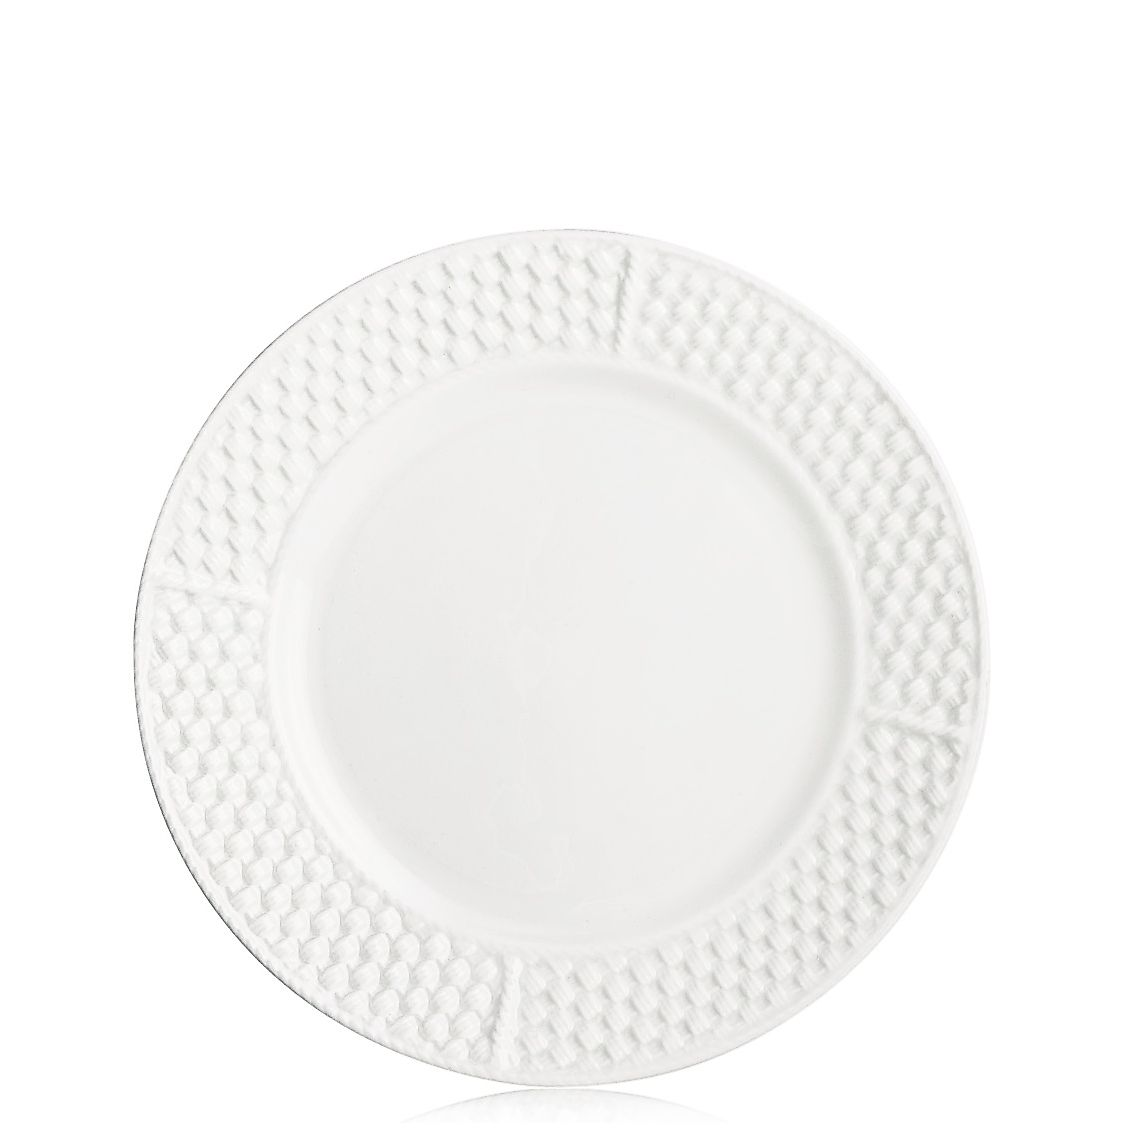 tiffany weave dessert plate in irish parian bone china  tiffany  - tiffany weavedessert plate